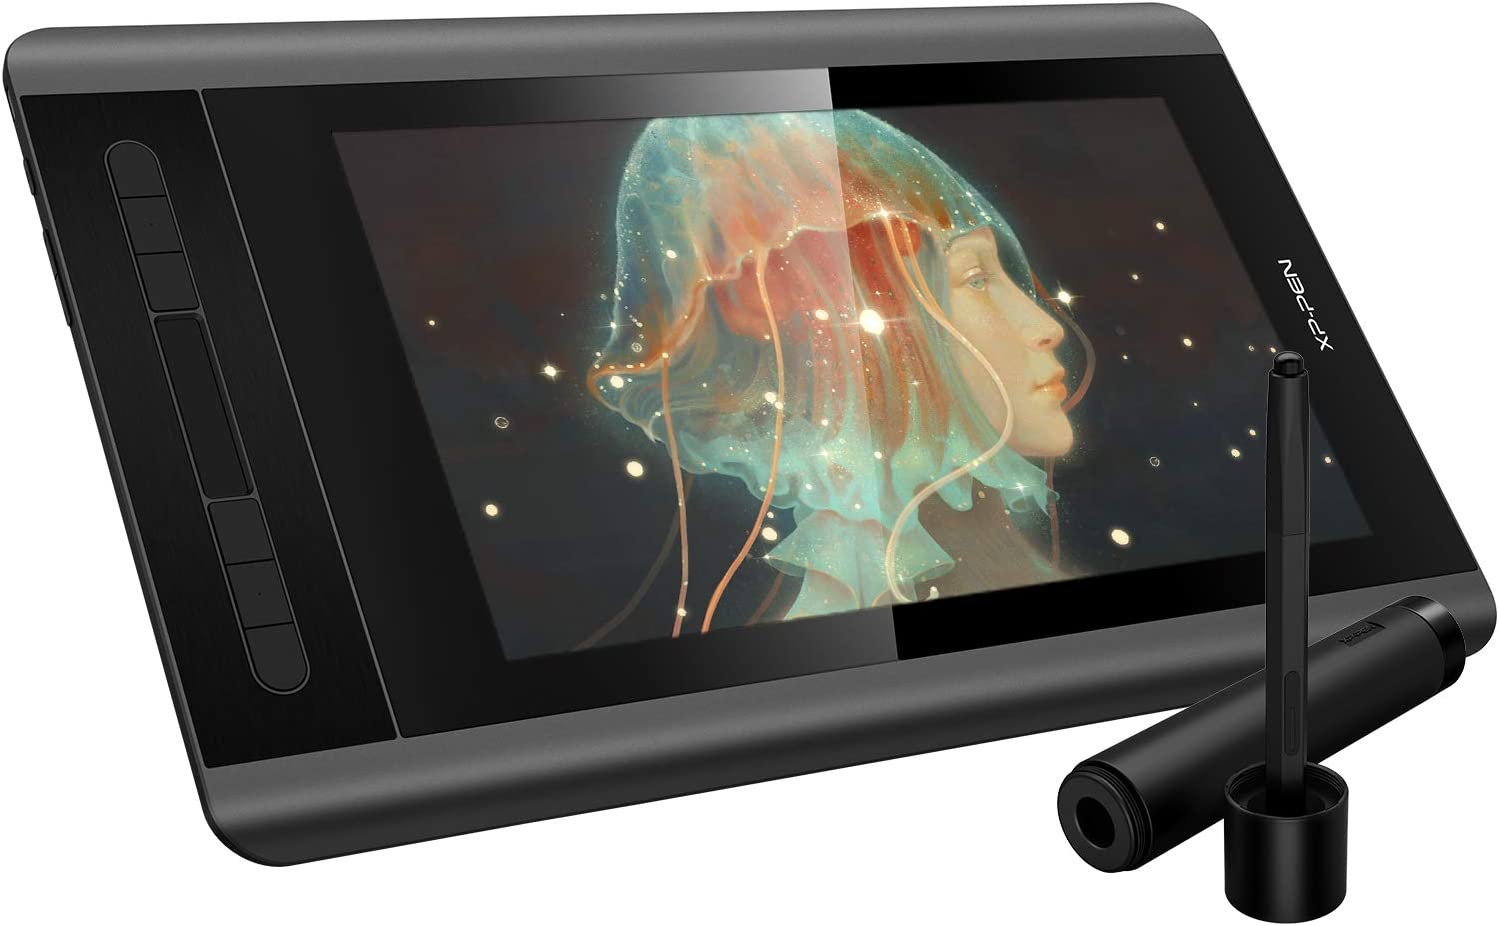 Tableta Digitalizadora XP-PEN Artist12 11.6 Inch Color